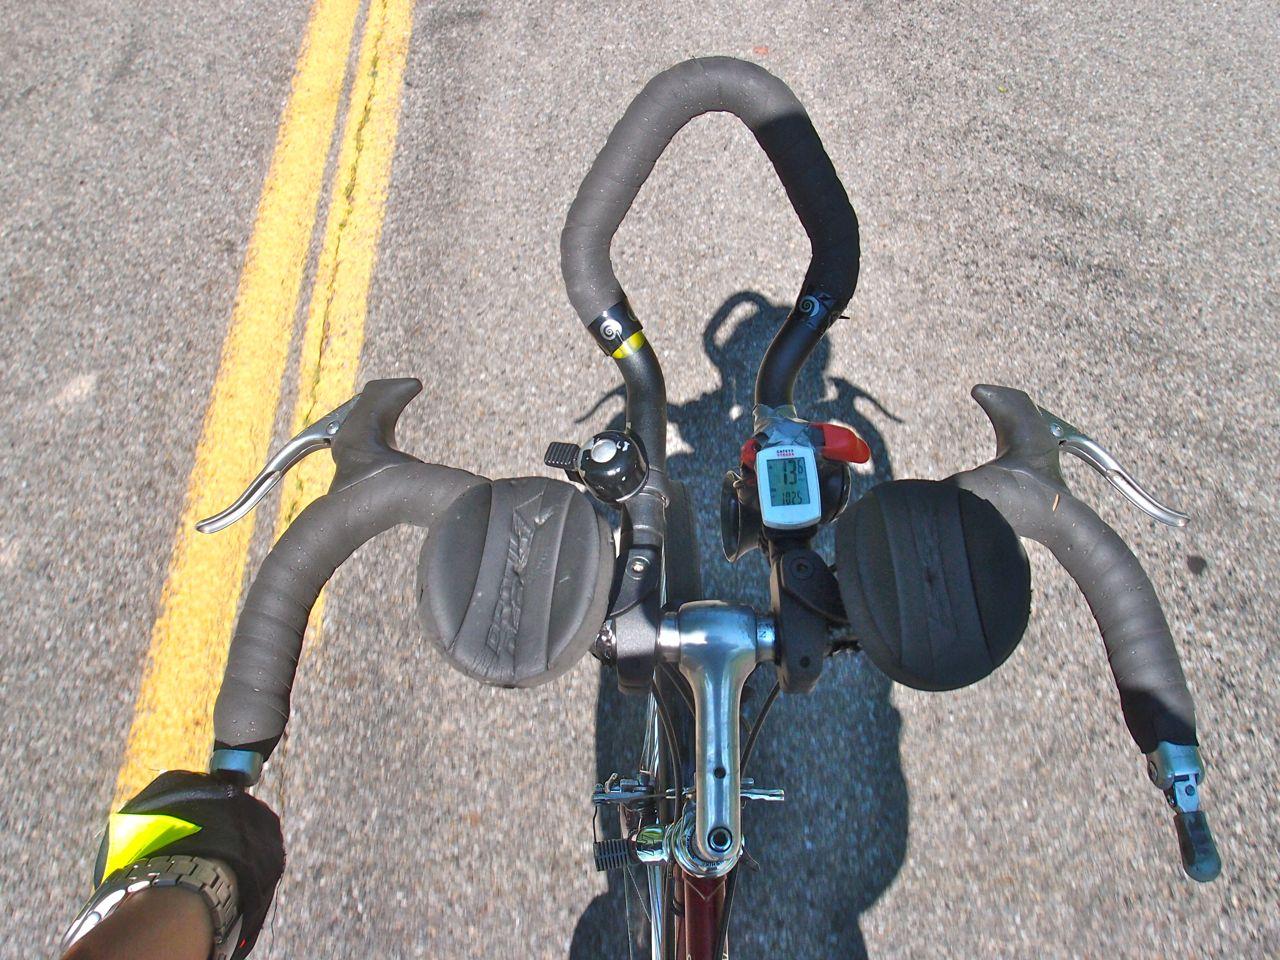 Kidbike | Biking in a Big City | Page 8